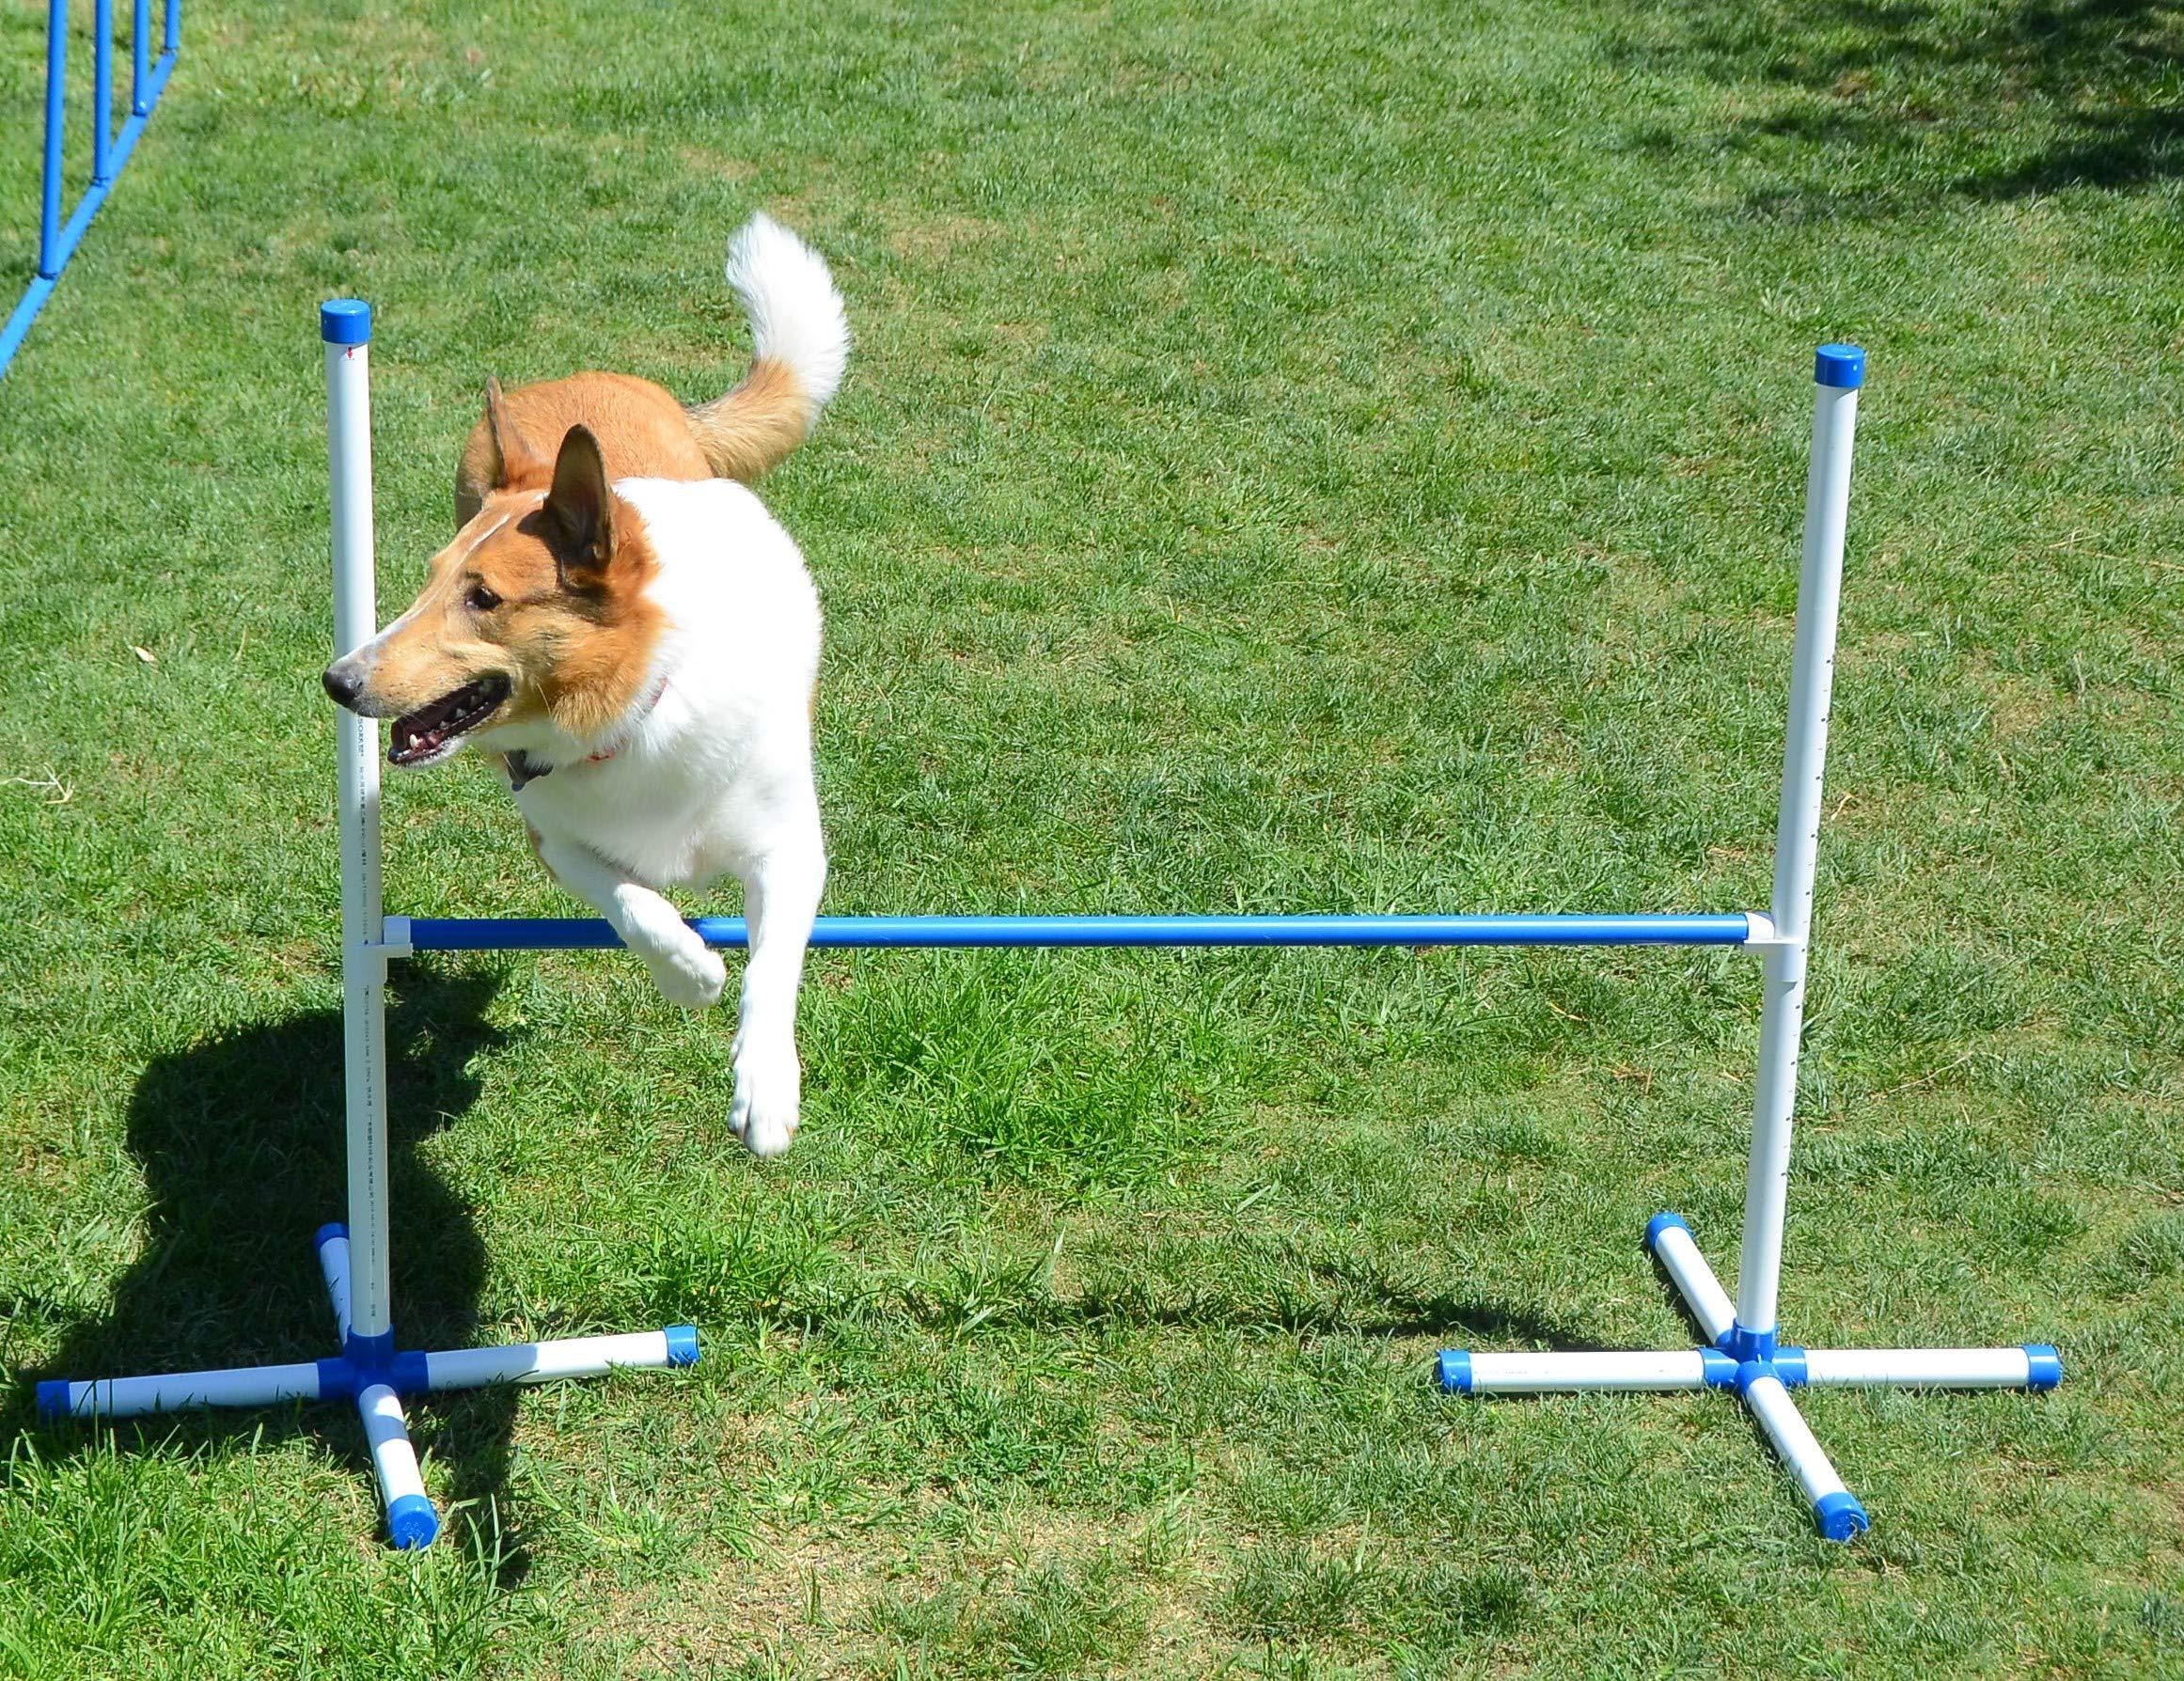 Dog Training Jump / Agility equipment / Dog Training /Dog Hurdle/Dog Agility Jump by Triple A Dogs